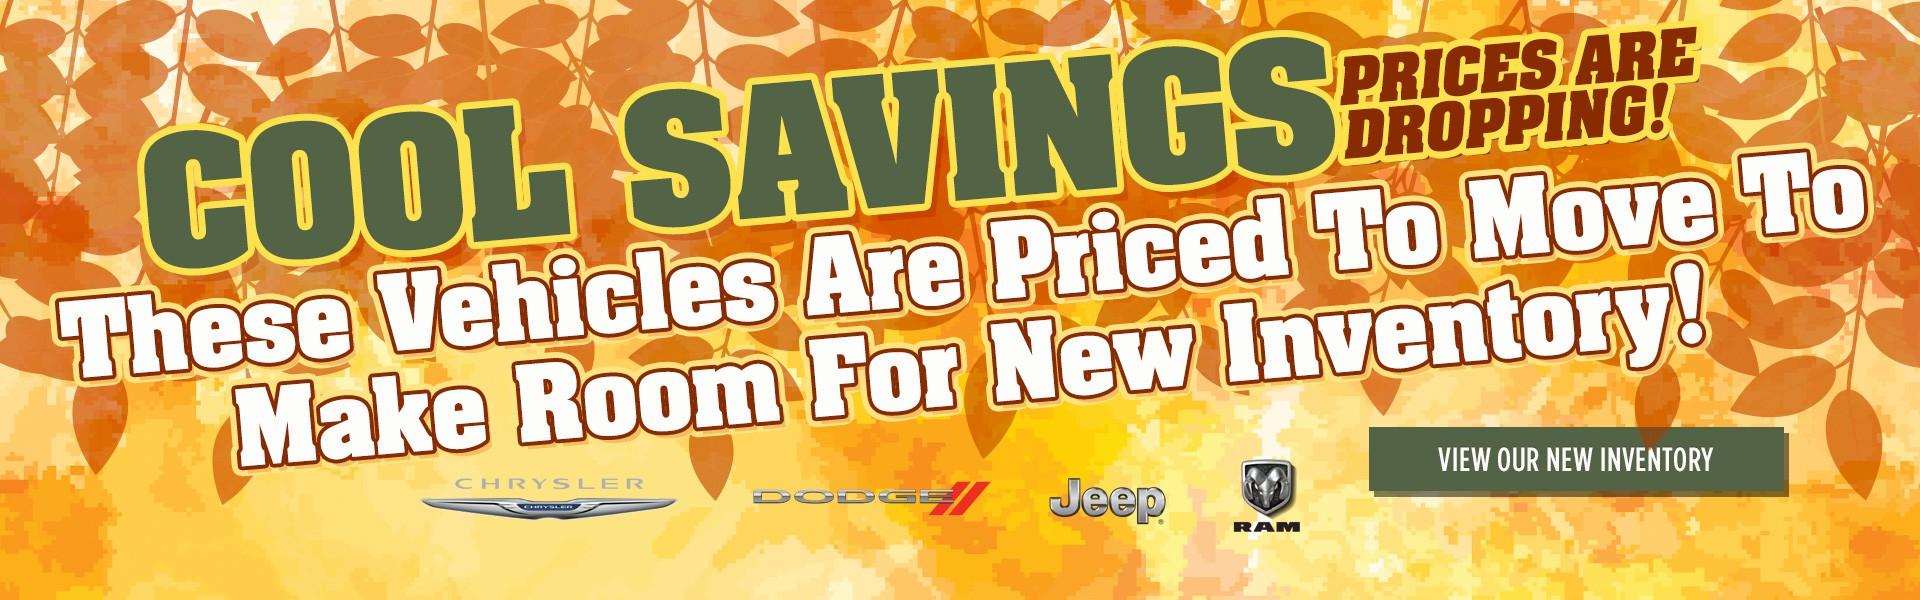 Cool Savings